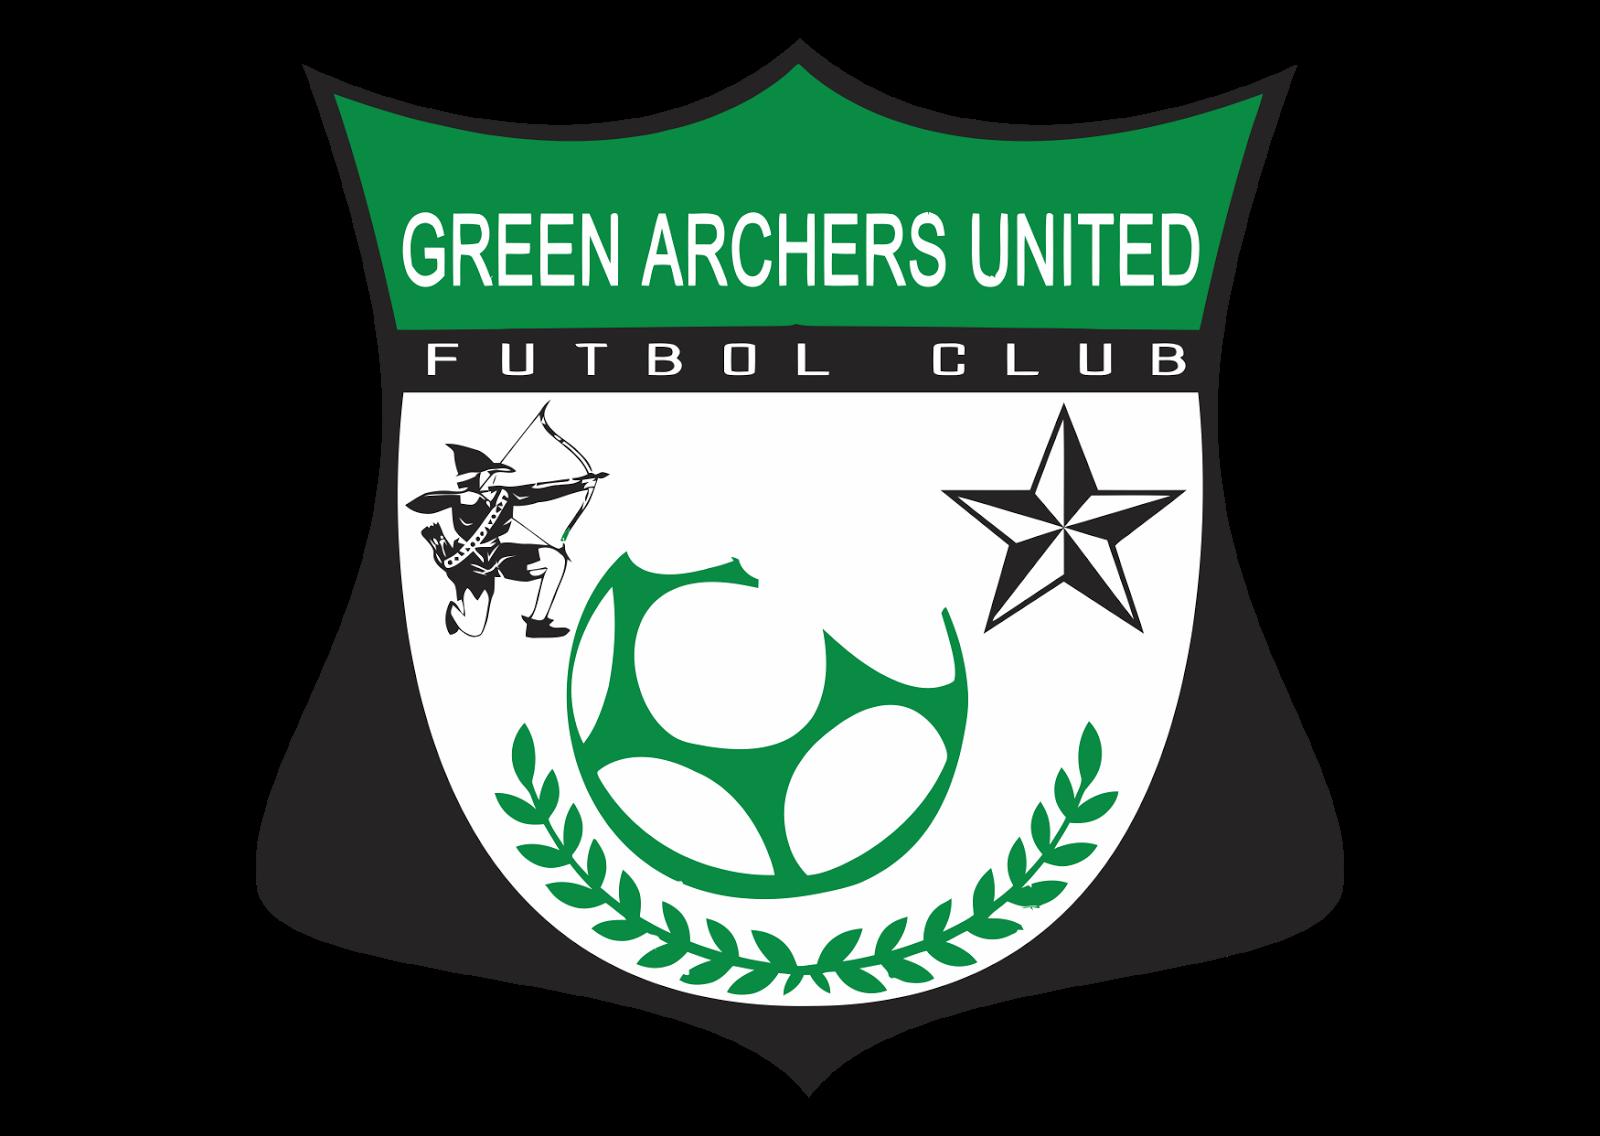 Green Archers United